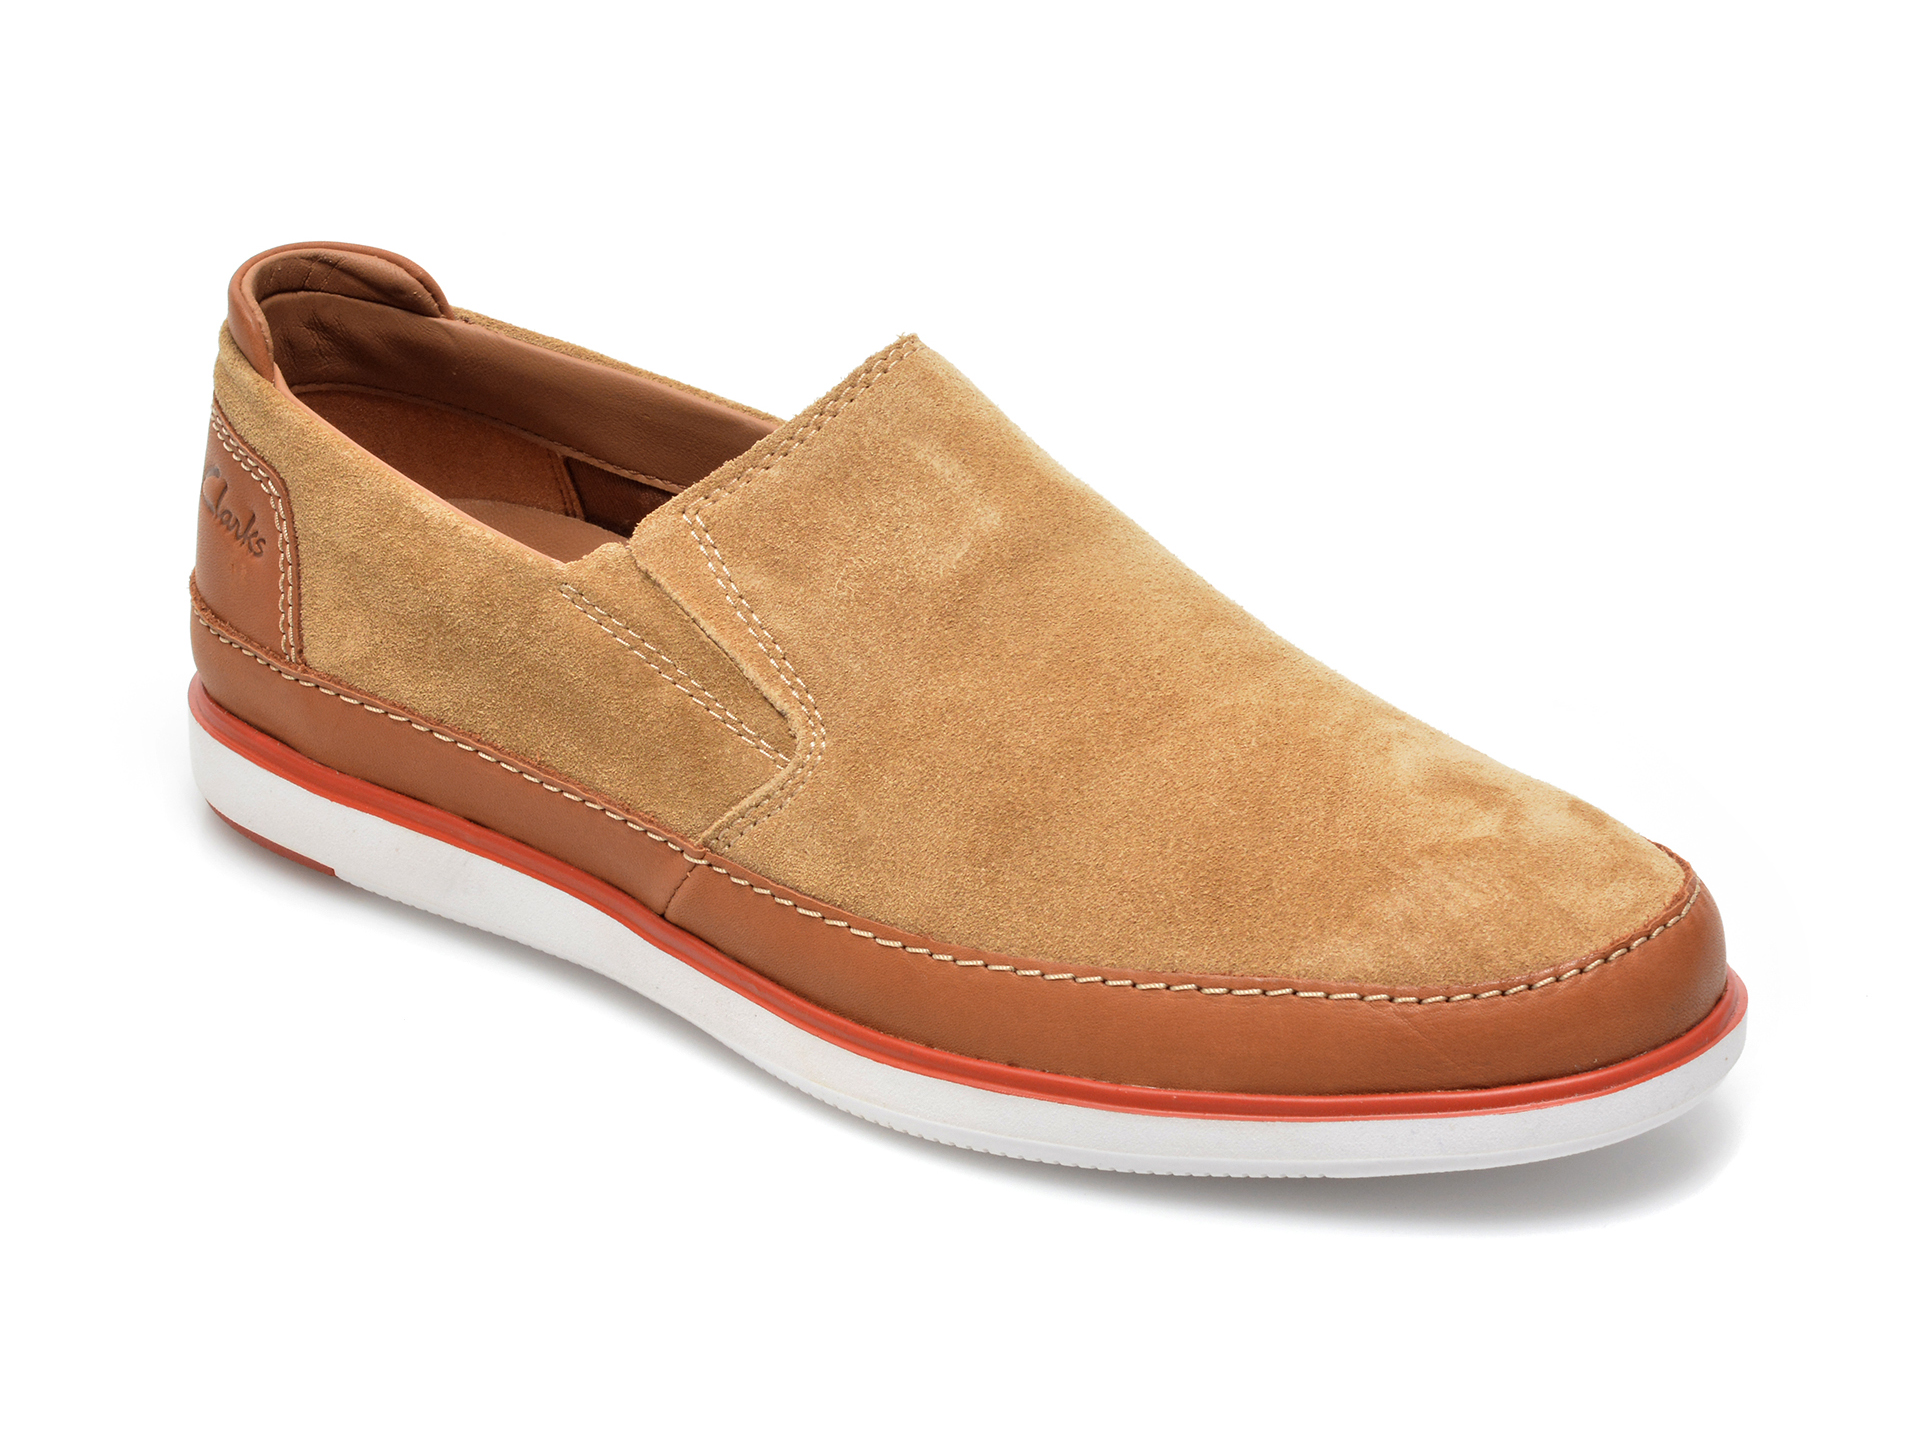 Pantofi Clarks Maro, Bratton Step, Din Piele Intoarsa